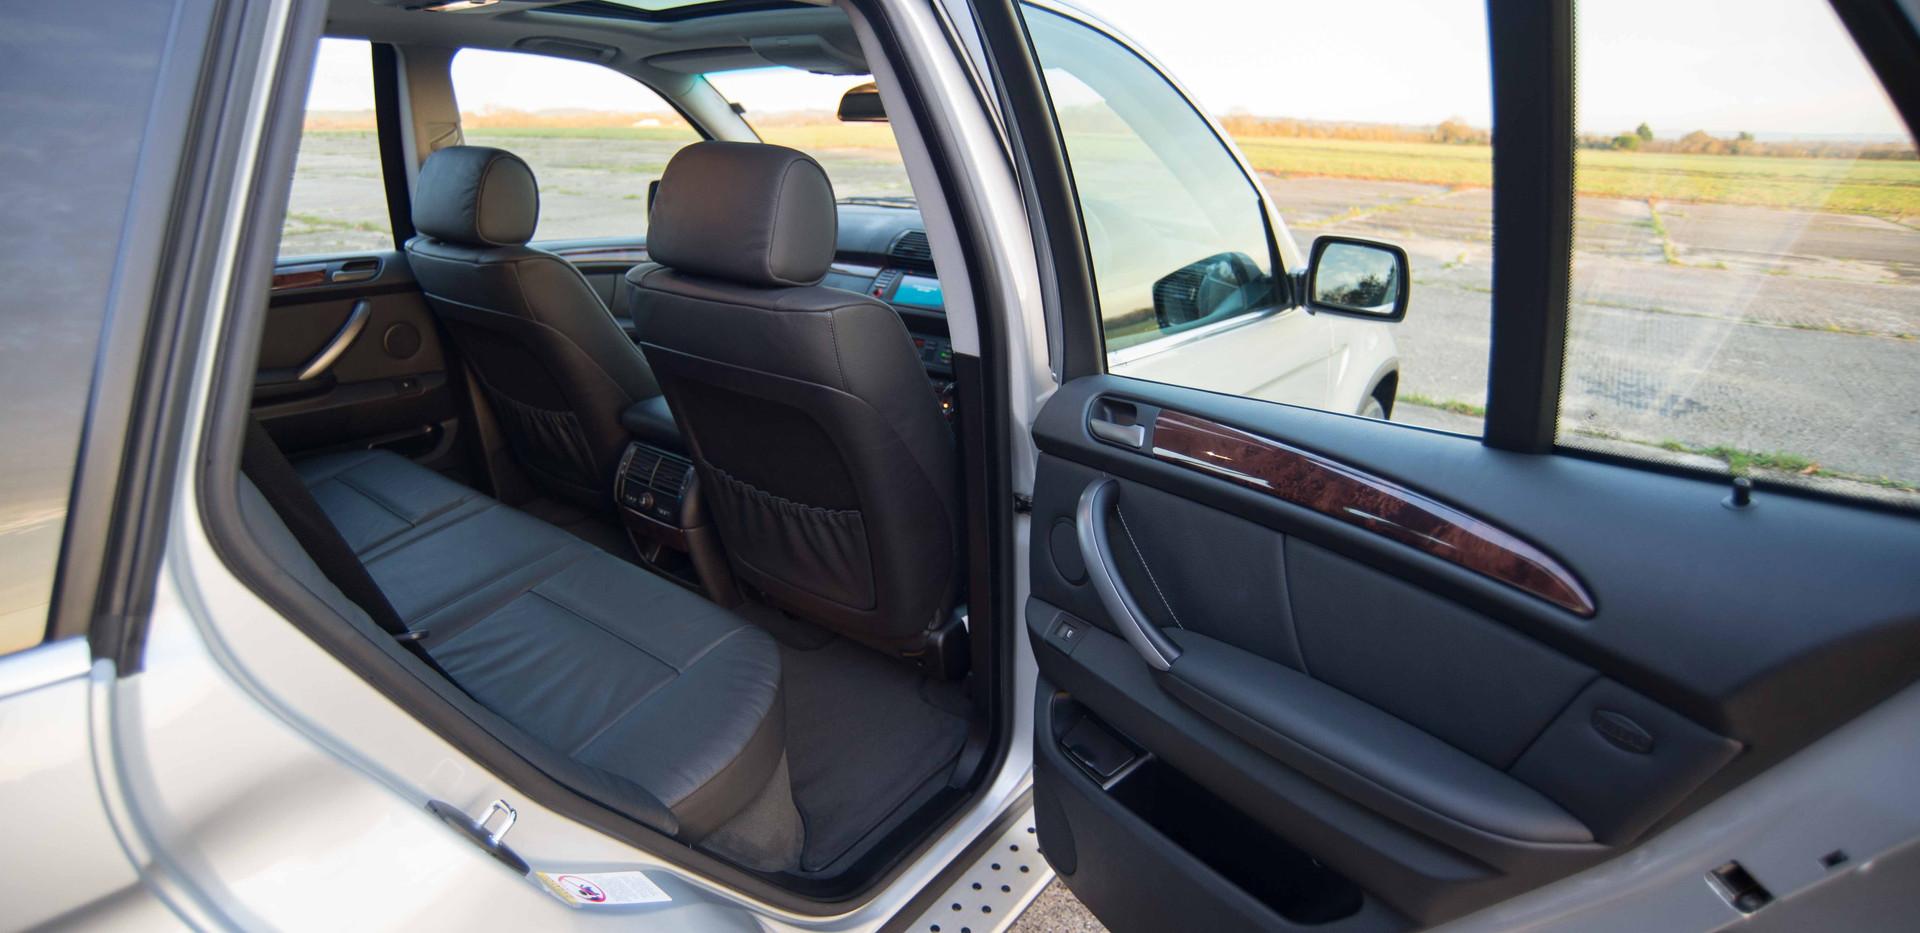 BMW E53 X5 4.4i For Sale UK London  (10